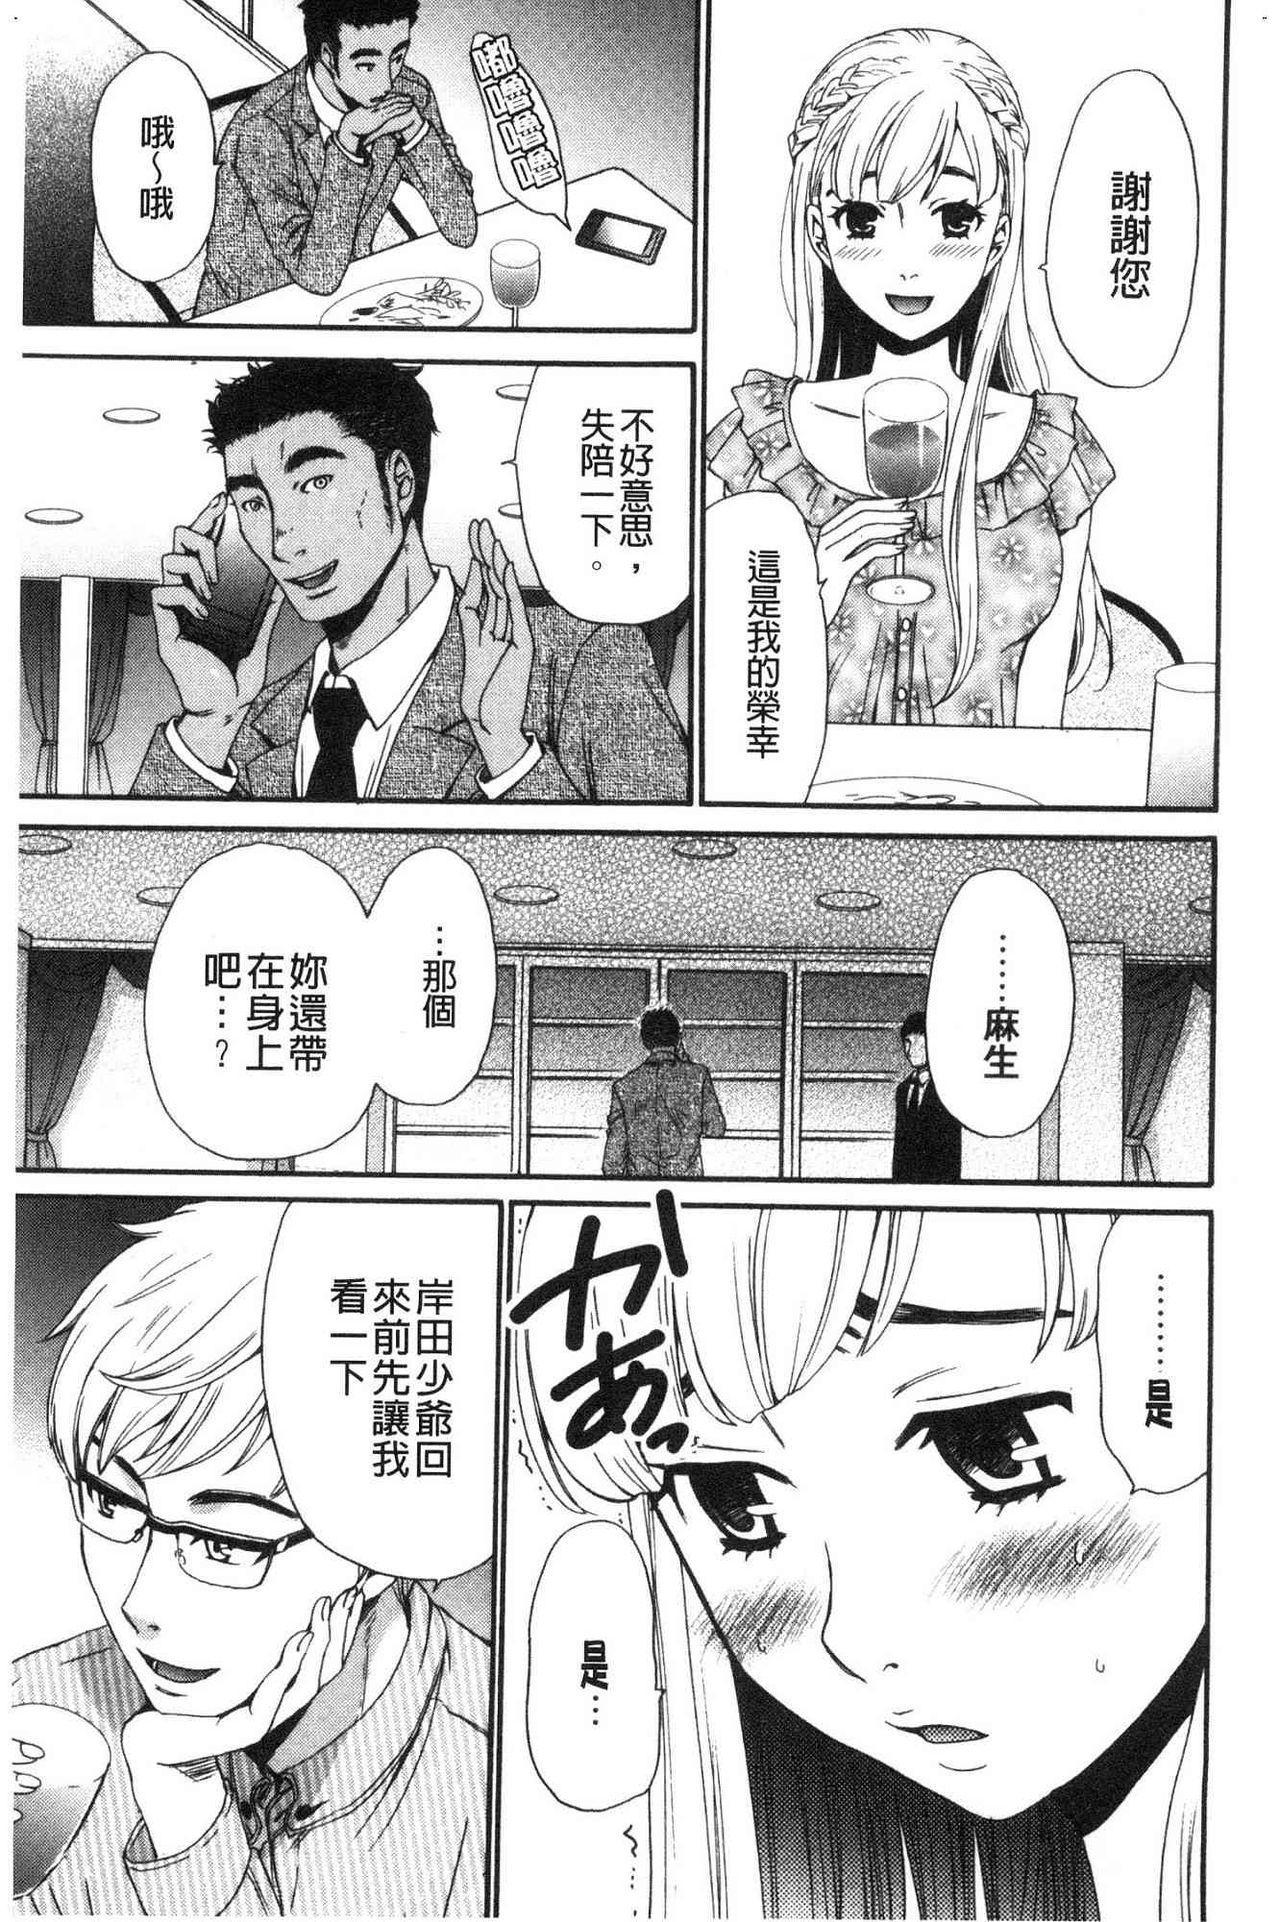 [Gotoh Akira]  21-ji no Onna ~Camera no Mae no Mesuinu~ 2 | 21時之女 ~鏡頭前的牝犬~ 2 [Chinese] 8